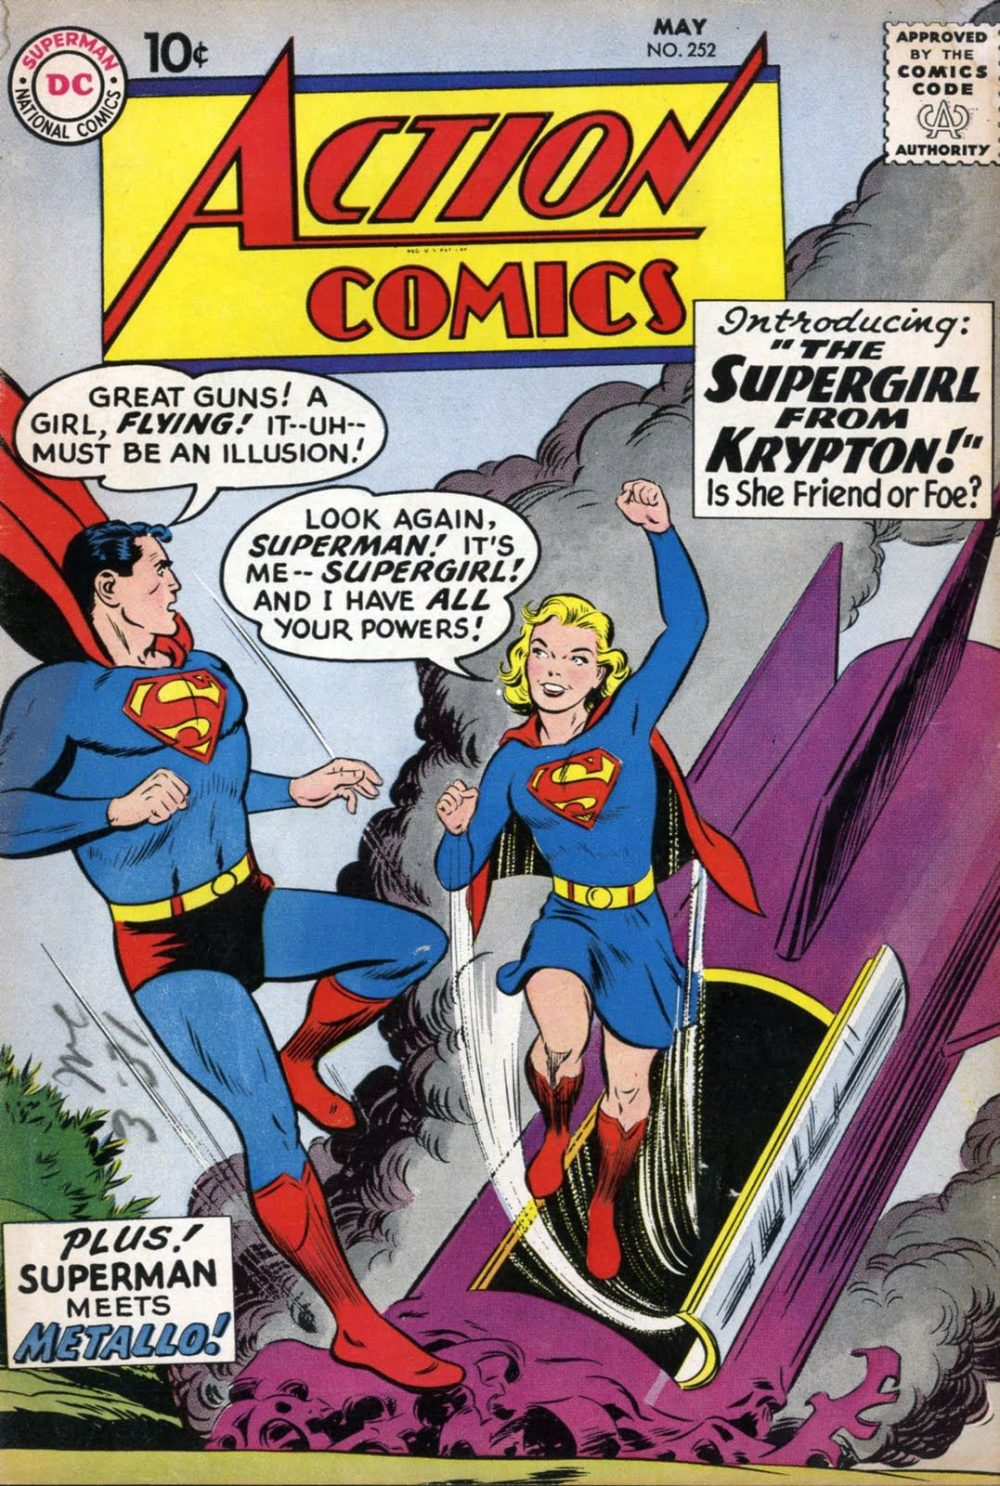 Adventure Comics #252